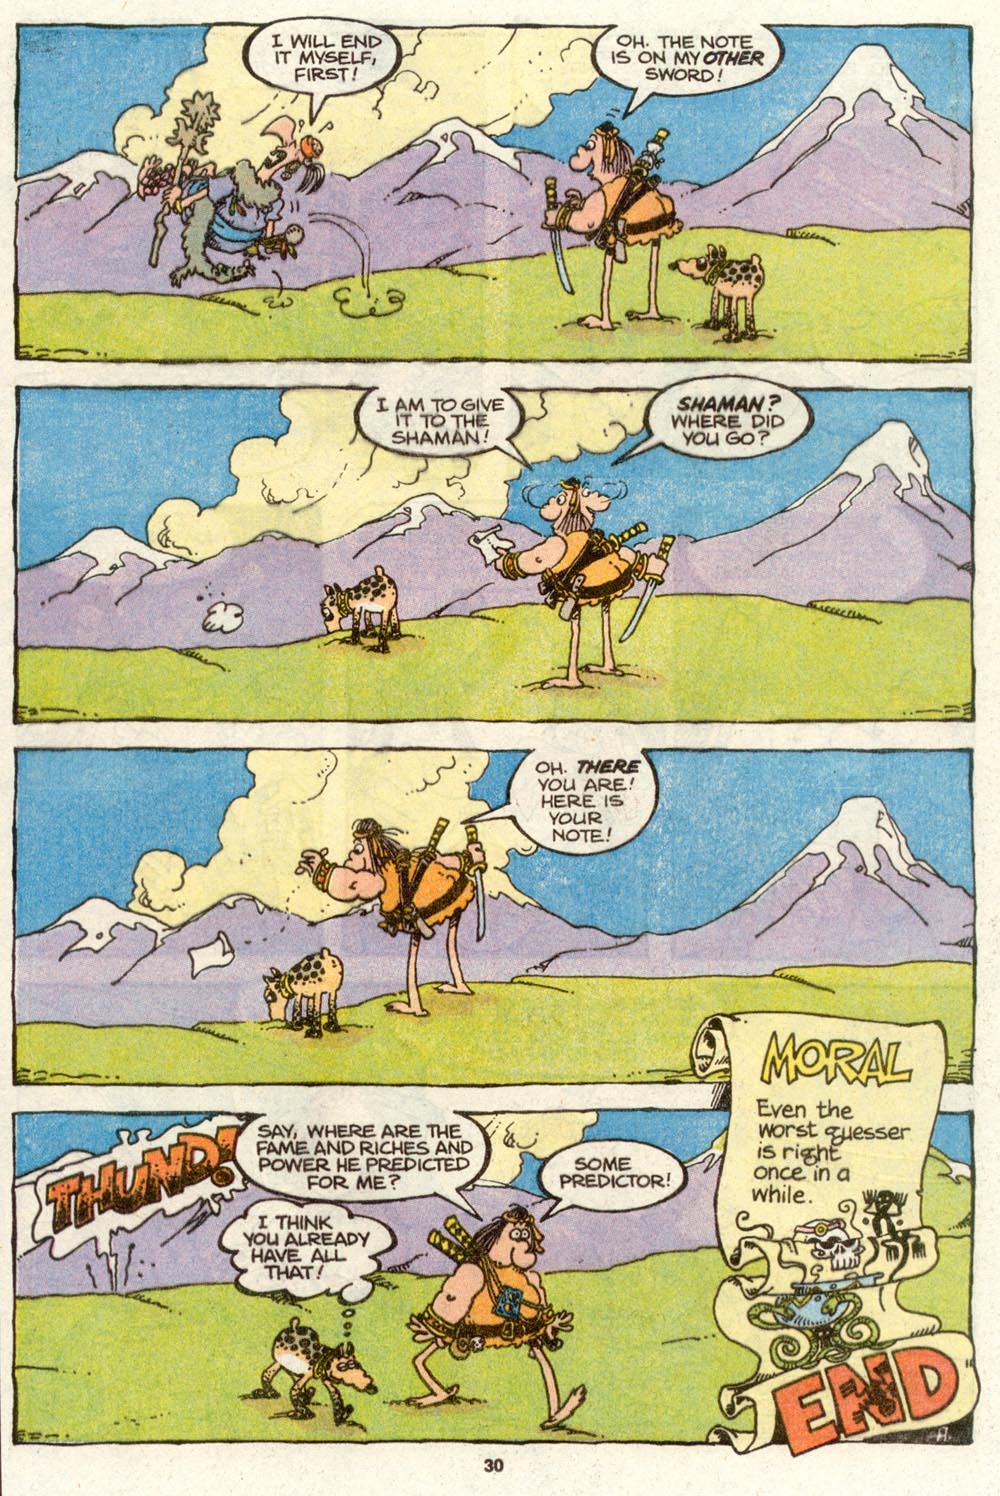 Read online Sergio Aragonés Groo the Wanderer comic -  Issue #72 - 23